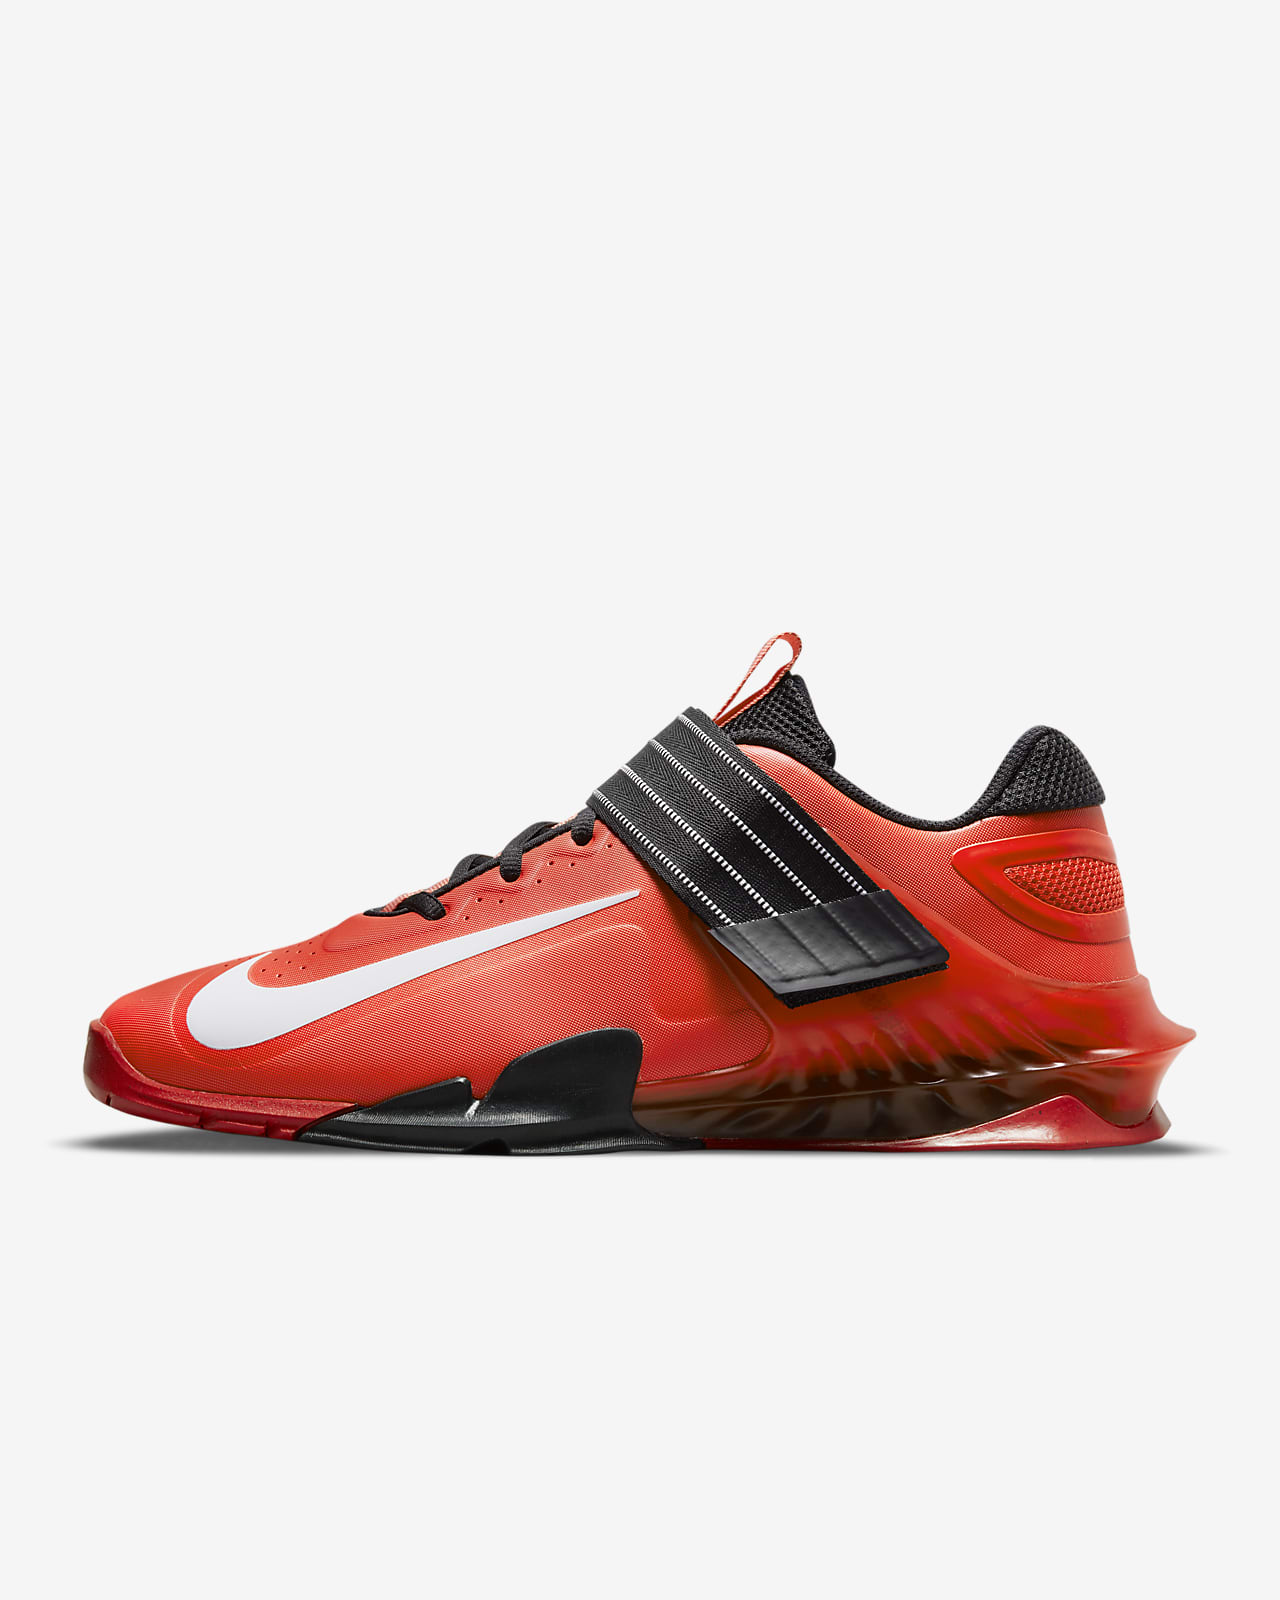 Sapatilhas de halterofilismo Nike Savaleos